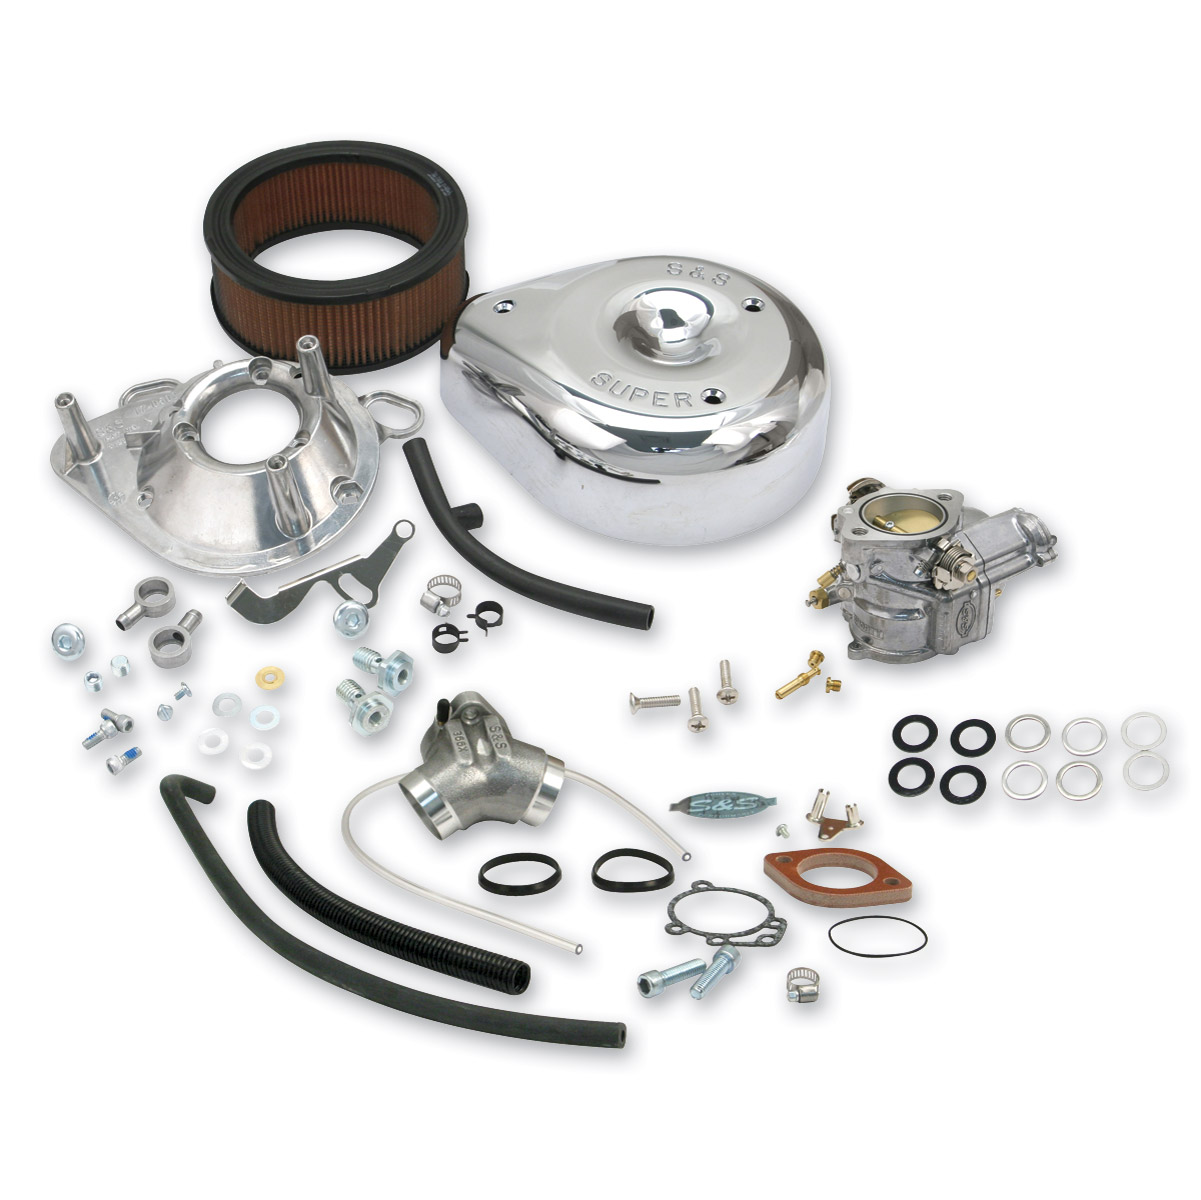 s&s cycle super 'e' complete carburetor kit